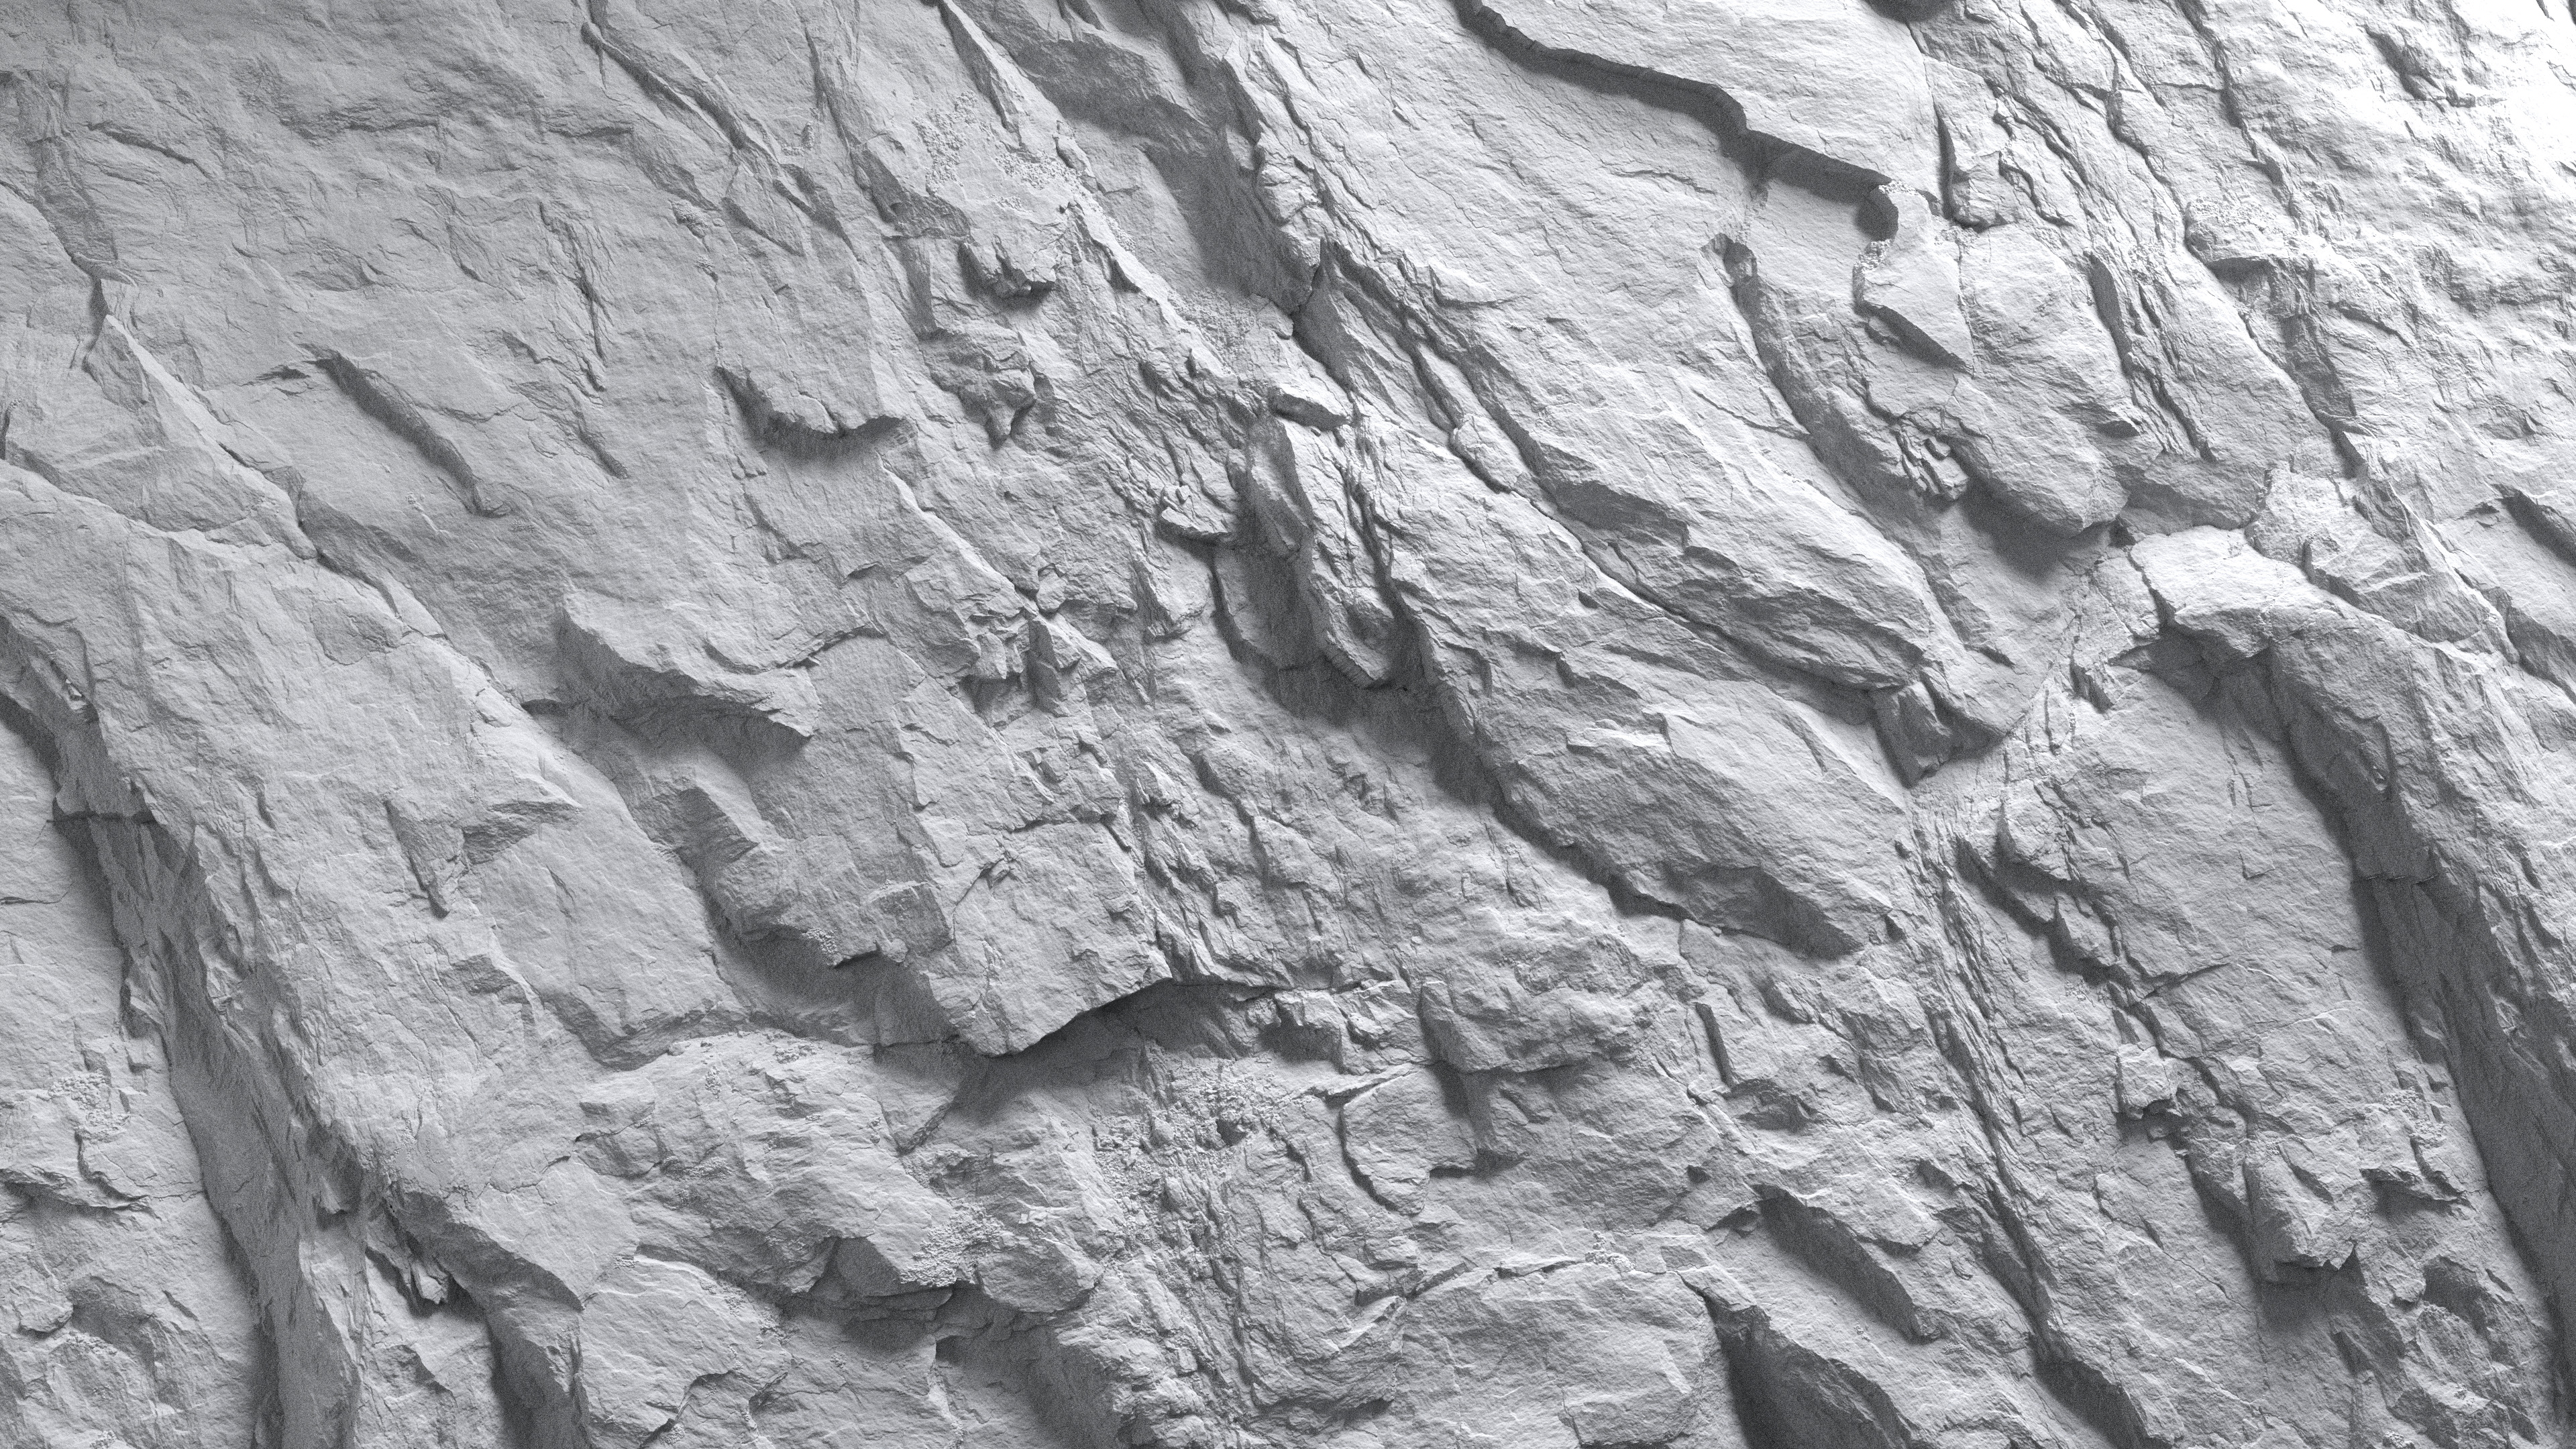 3d Scanned Rock Surface 4x4 Meters